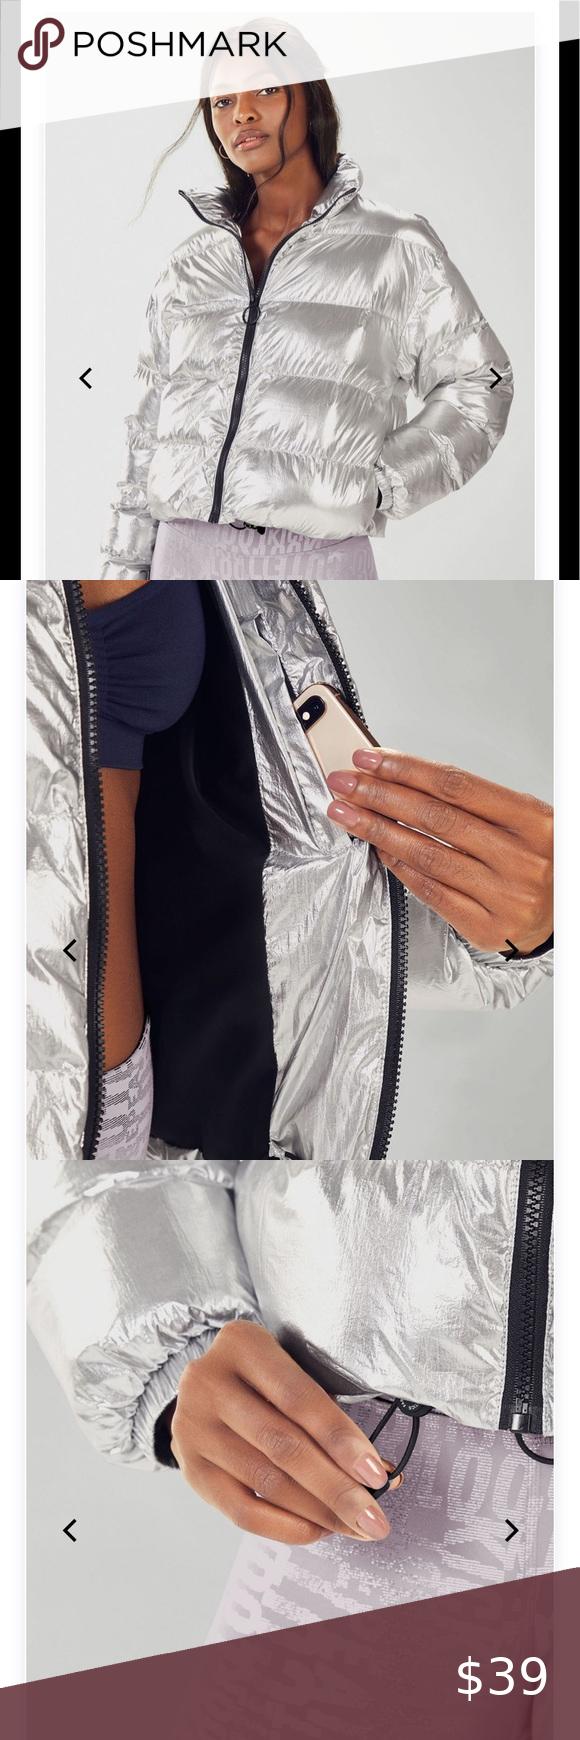 Fabletics Wander Puffer Jacket Beautiful Jacket Fashion Jackets [ 1740 x 580 Pixel ]